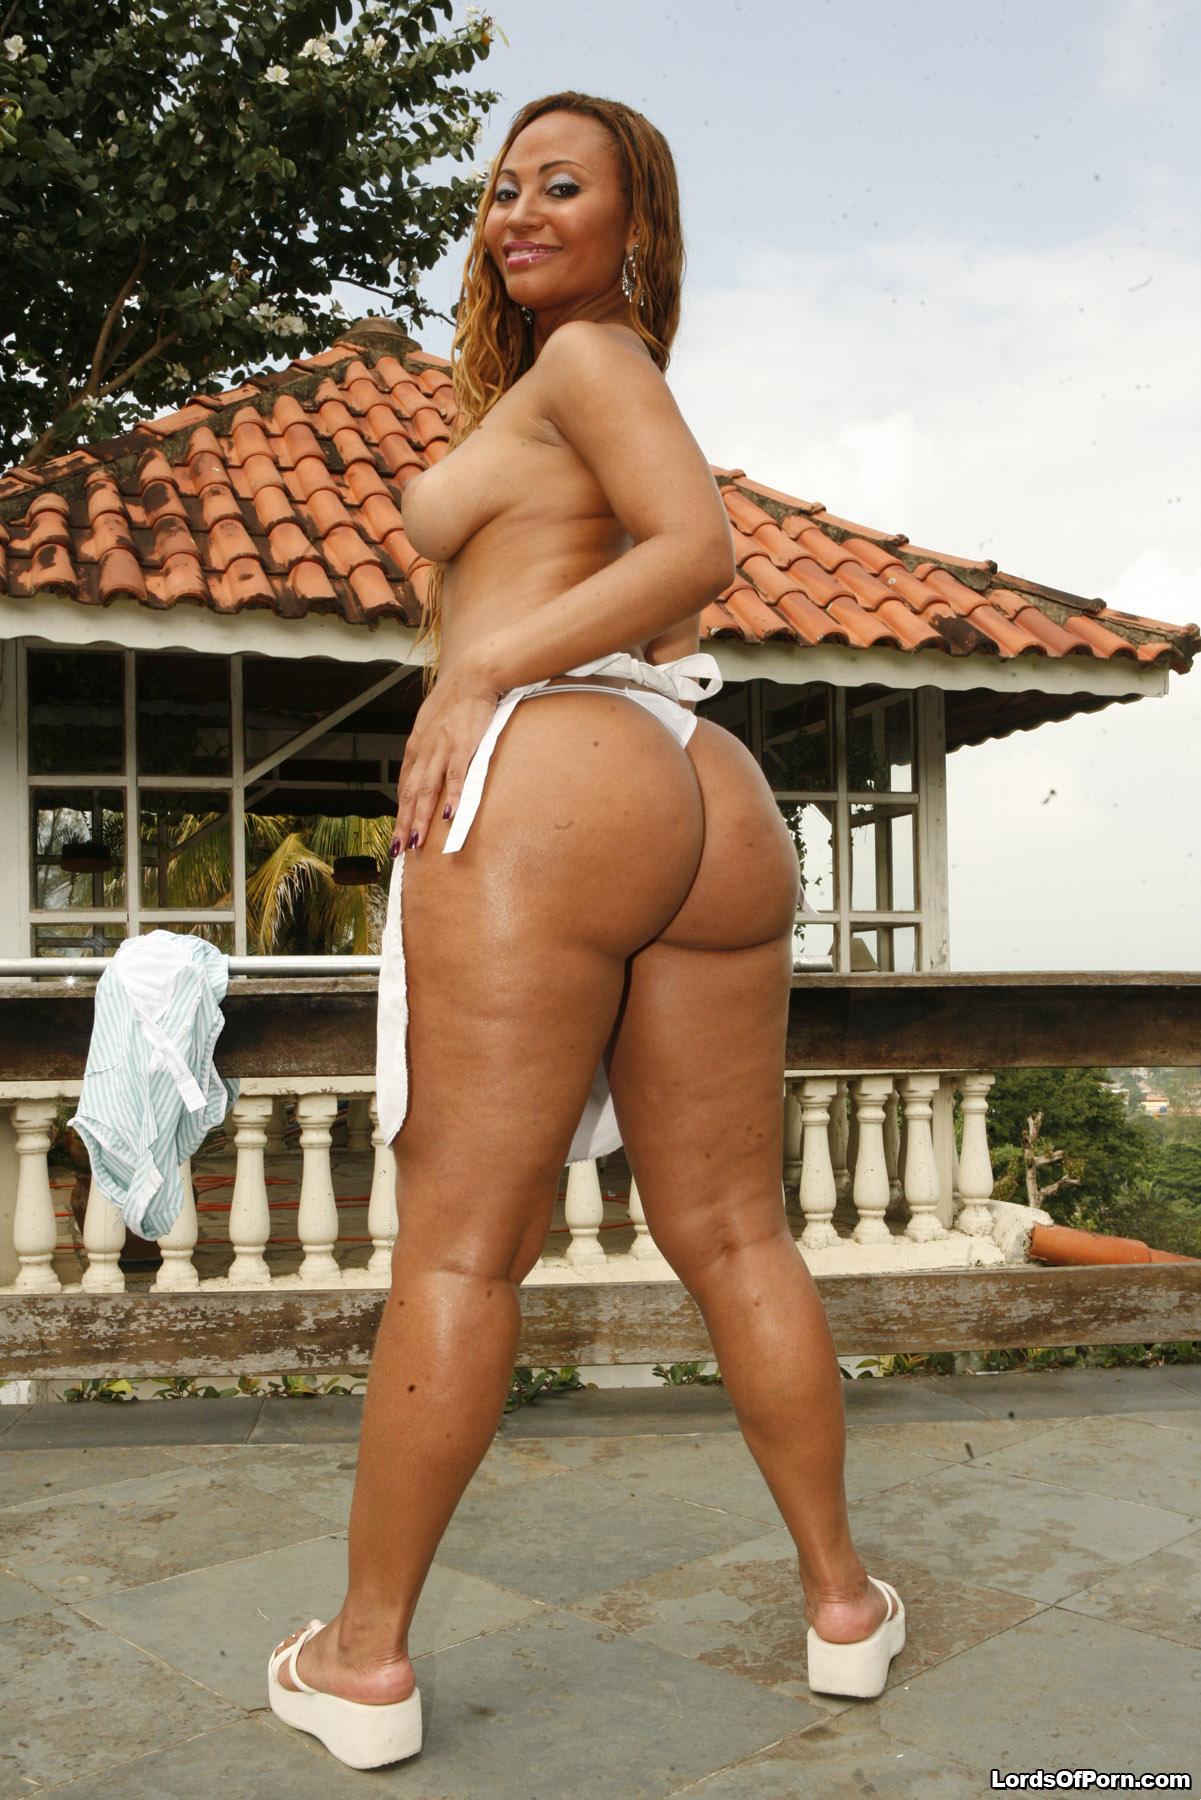 Luana Alves Booty Ideal showing xxx images for luana alves sex xxx | www.fuckpix.club